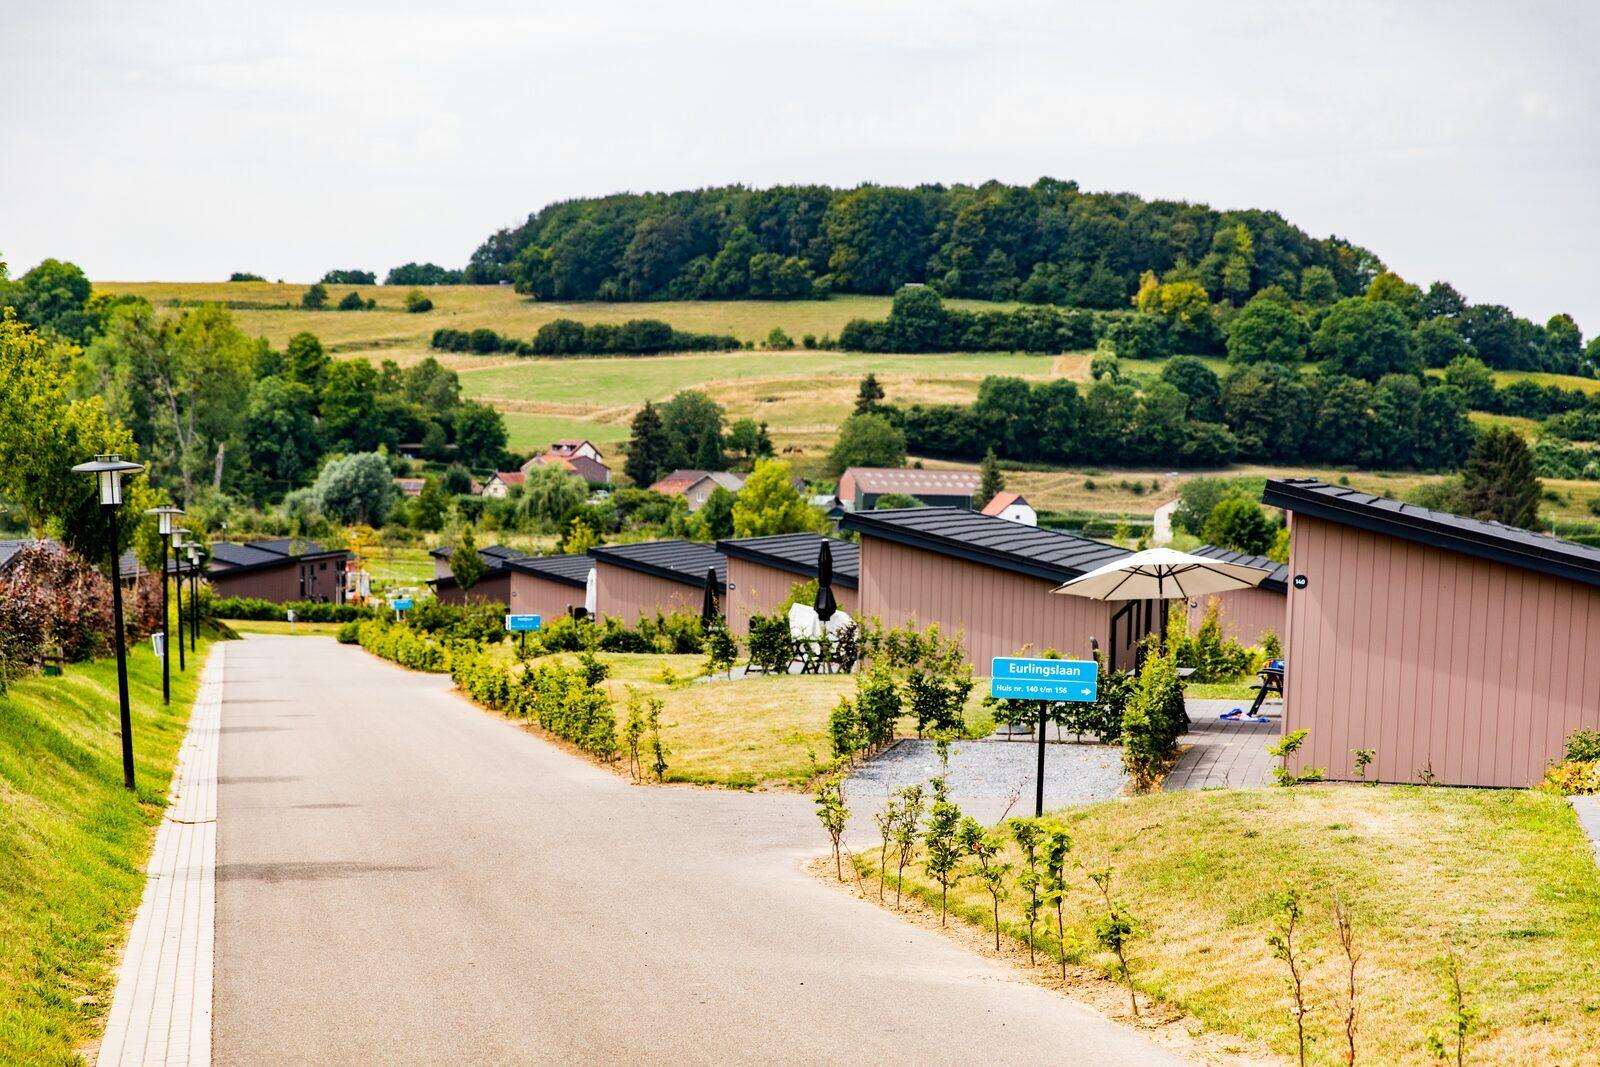 Holiday Park South Limburg